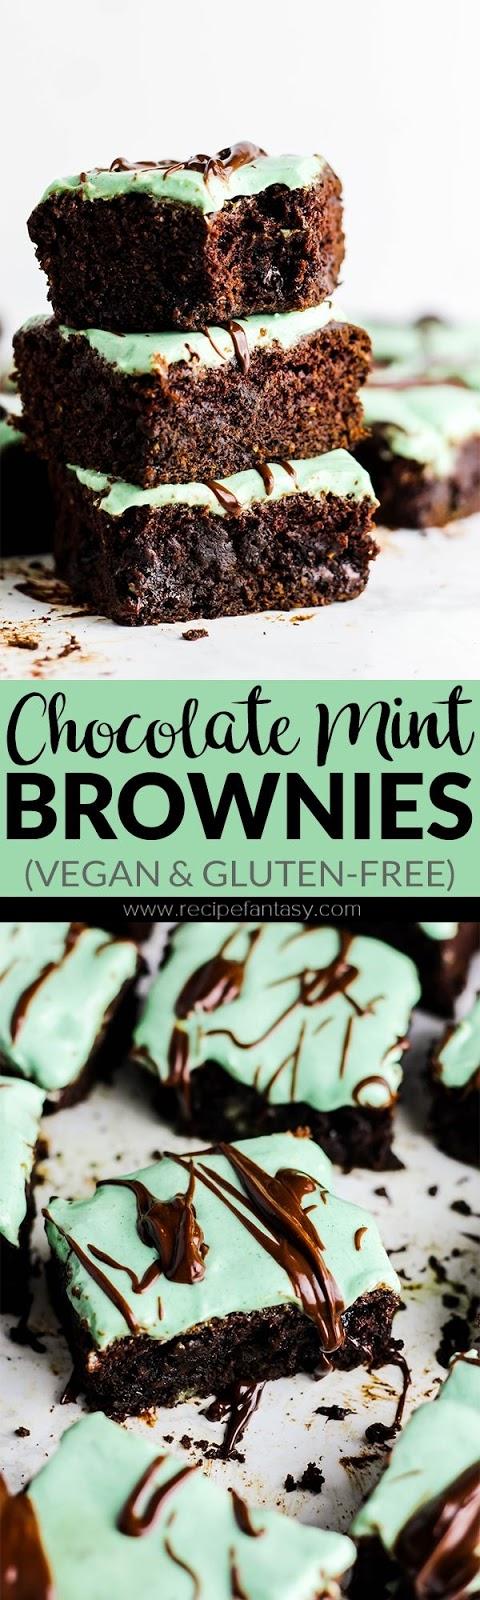 Chocolate Mint Brownies (vegan & gluten-free)